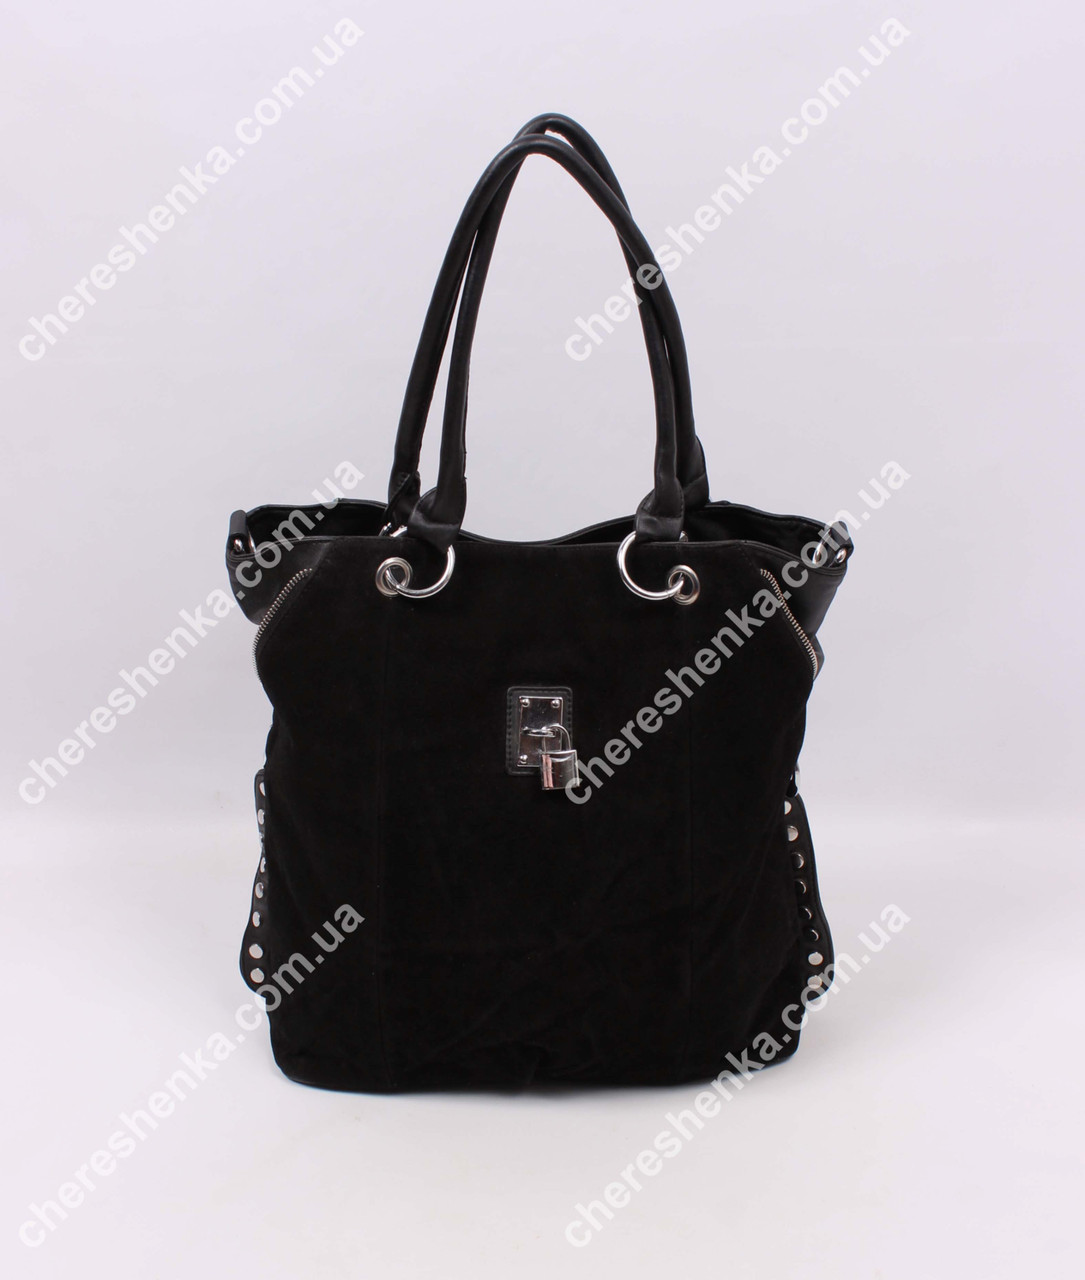 Женская сумочка Menchuanbali BT-028